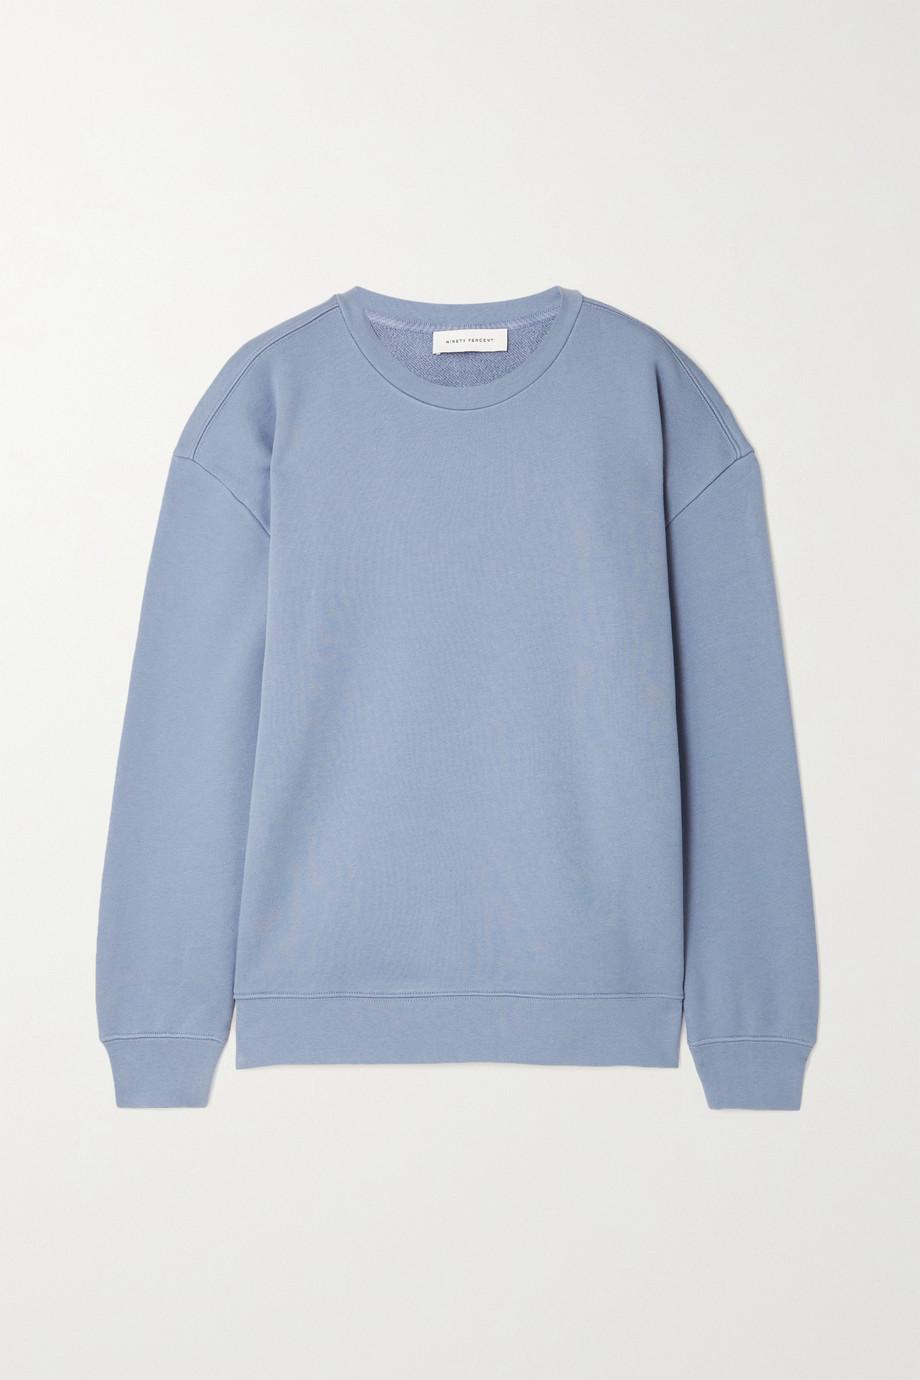 Ninety Percent + NET SUSTAIN Linda organic cotton-terry sweatshirt